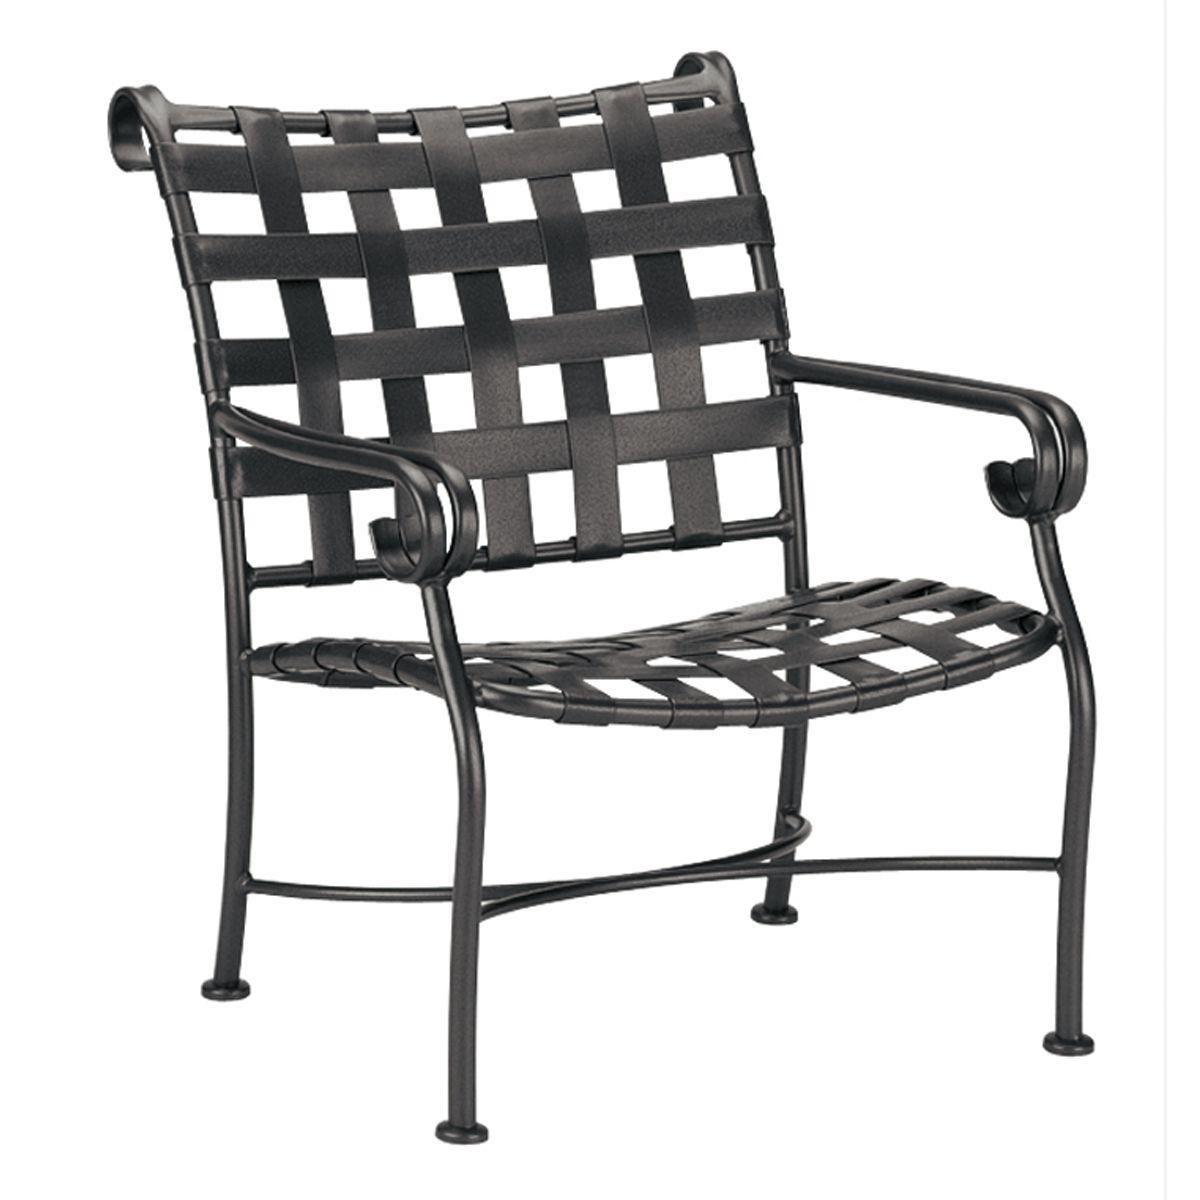 Ramsgate Strap Club Chair in size 1200 X 1200